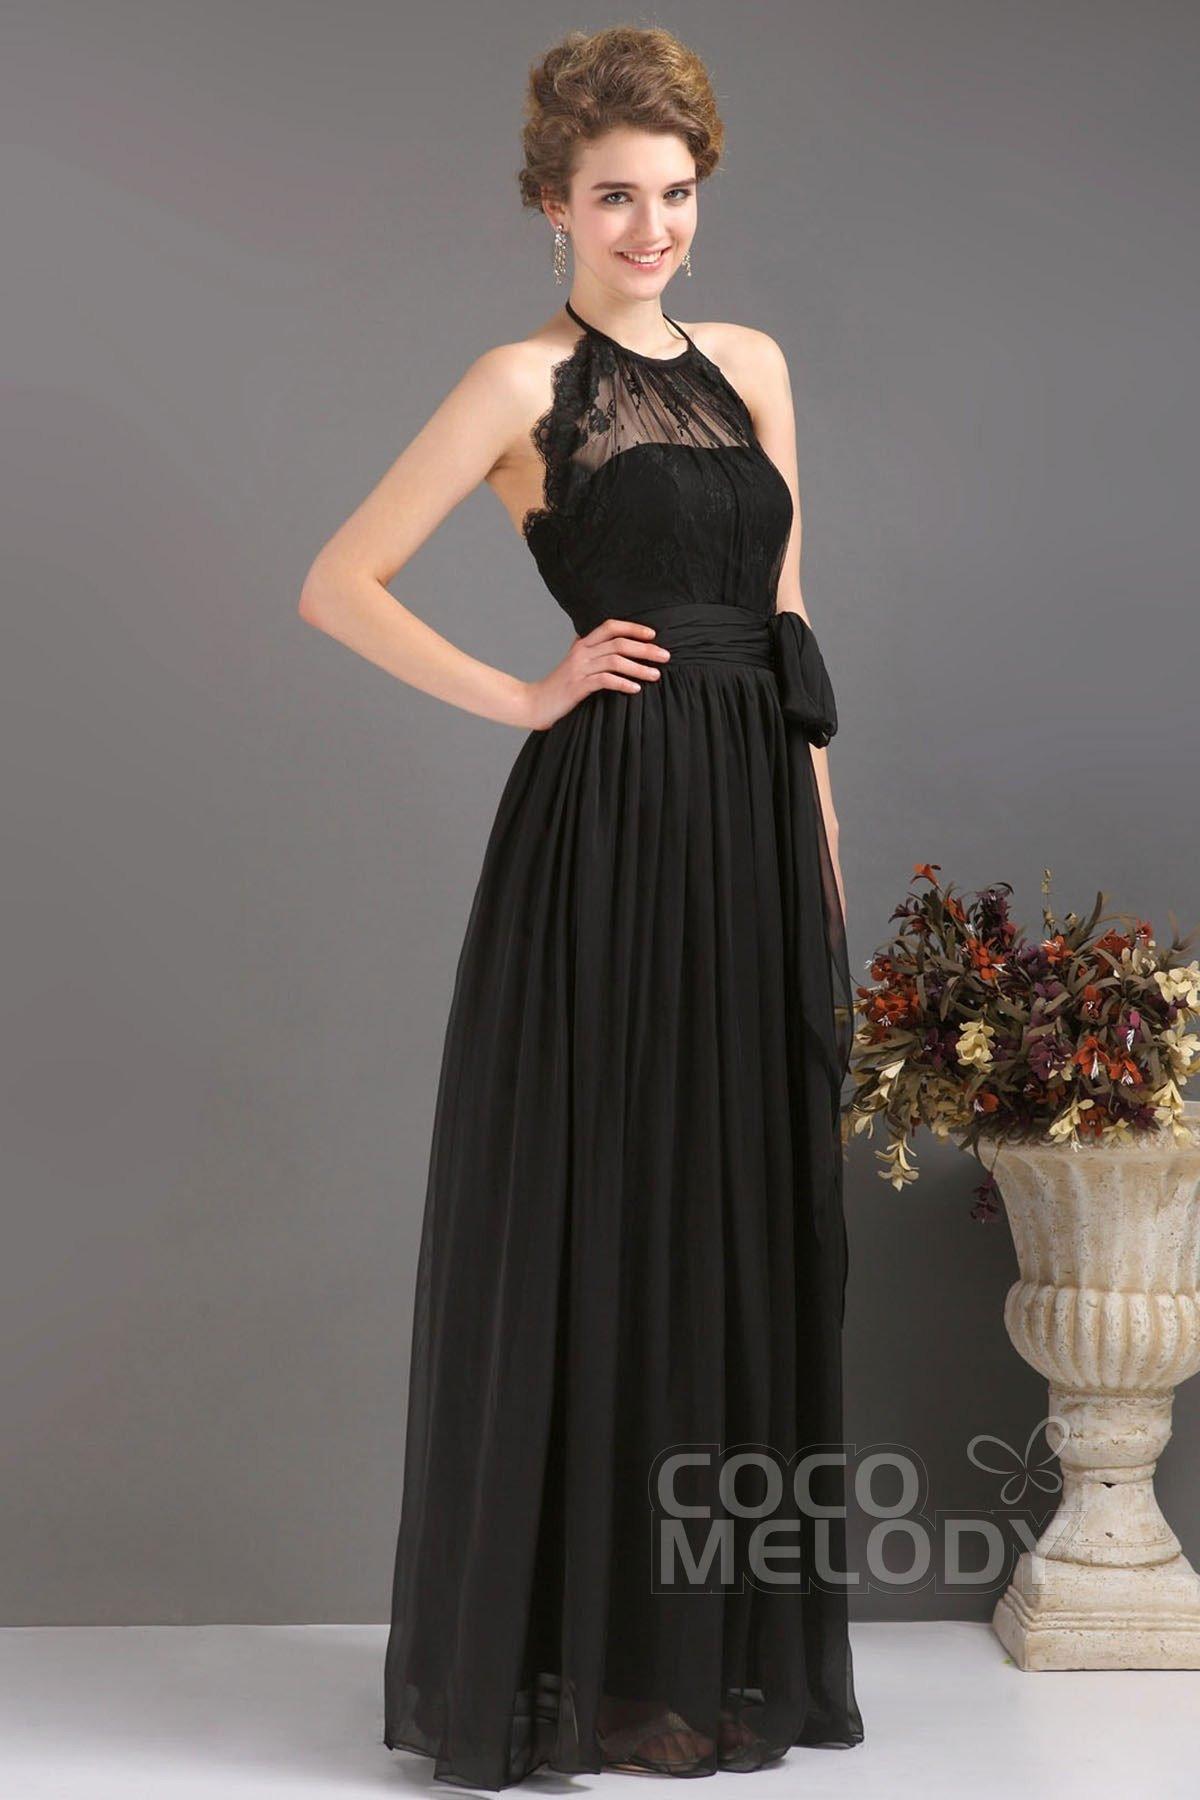 10 Einfach Abendkleid Bodenlang Design Elegant Abendkleid Bodenlang Galerie